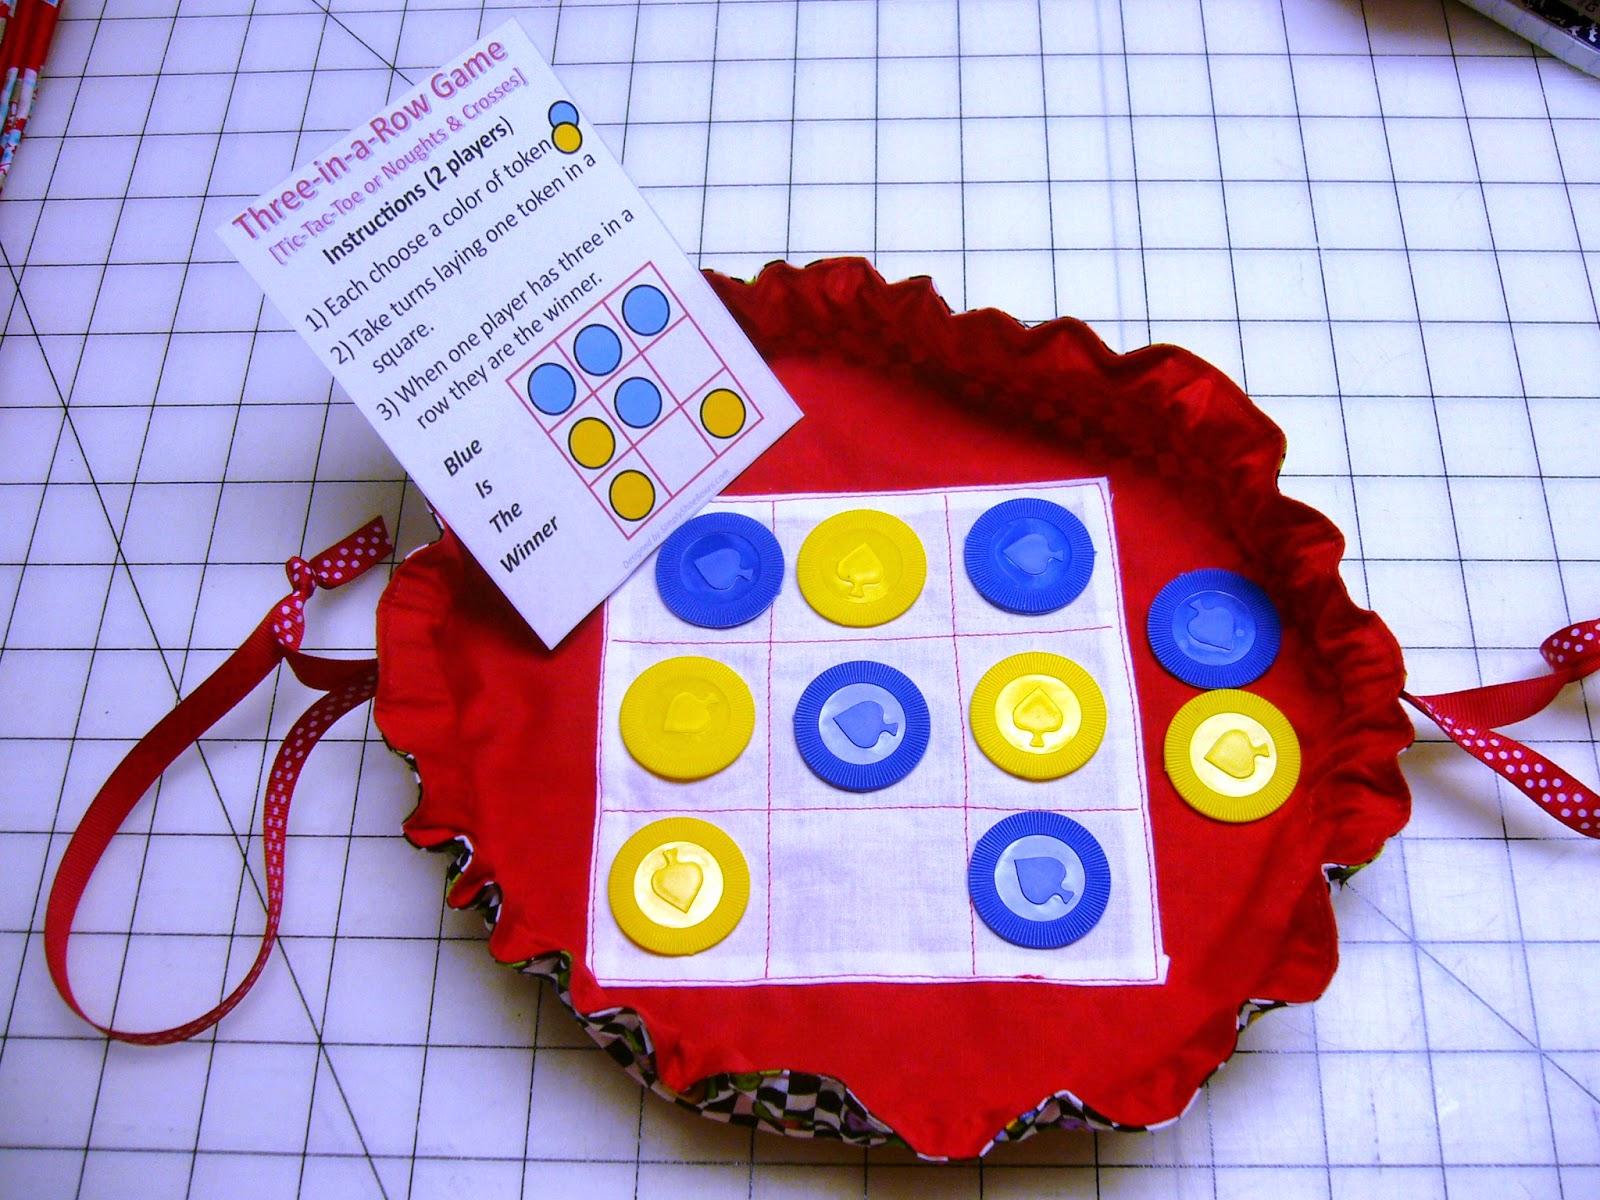 DIY Traveling Tic Tac Toe Game & Bag Instructions